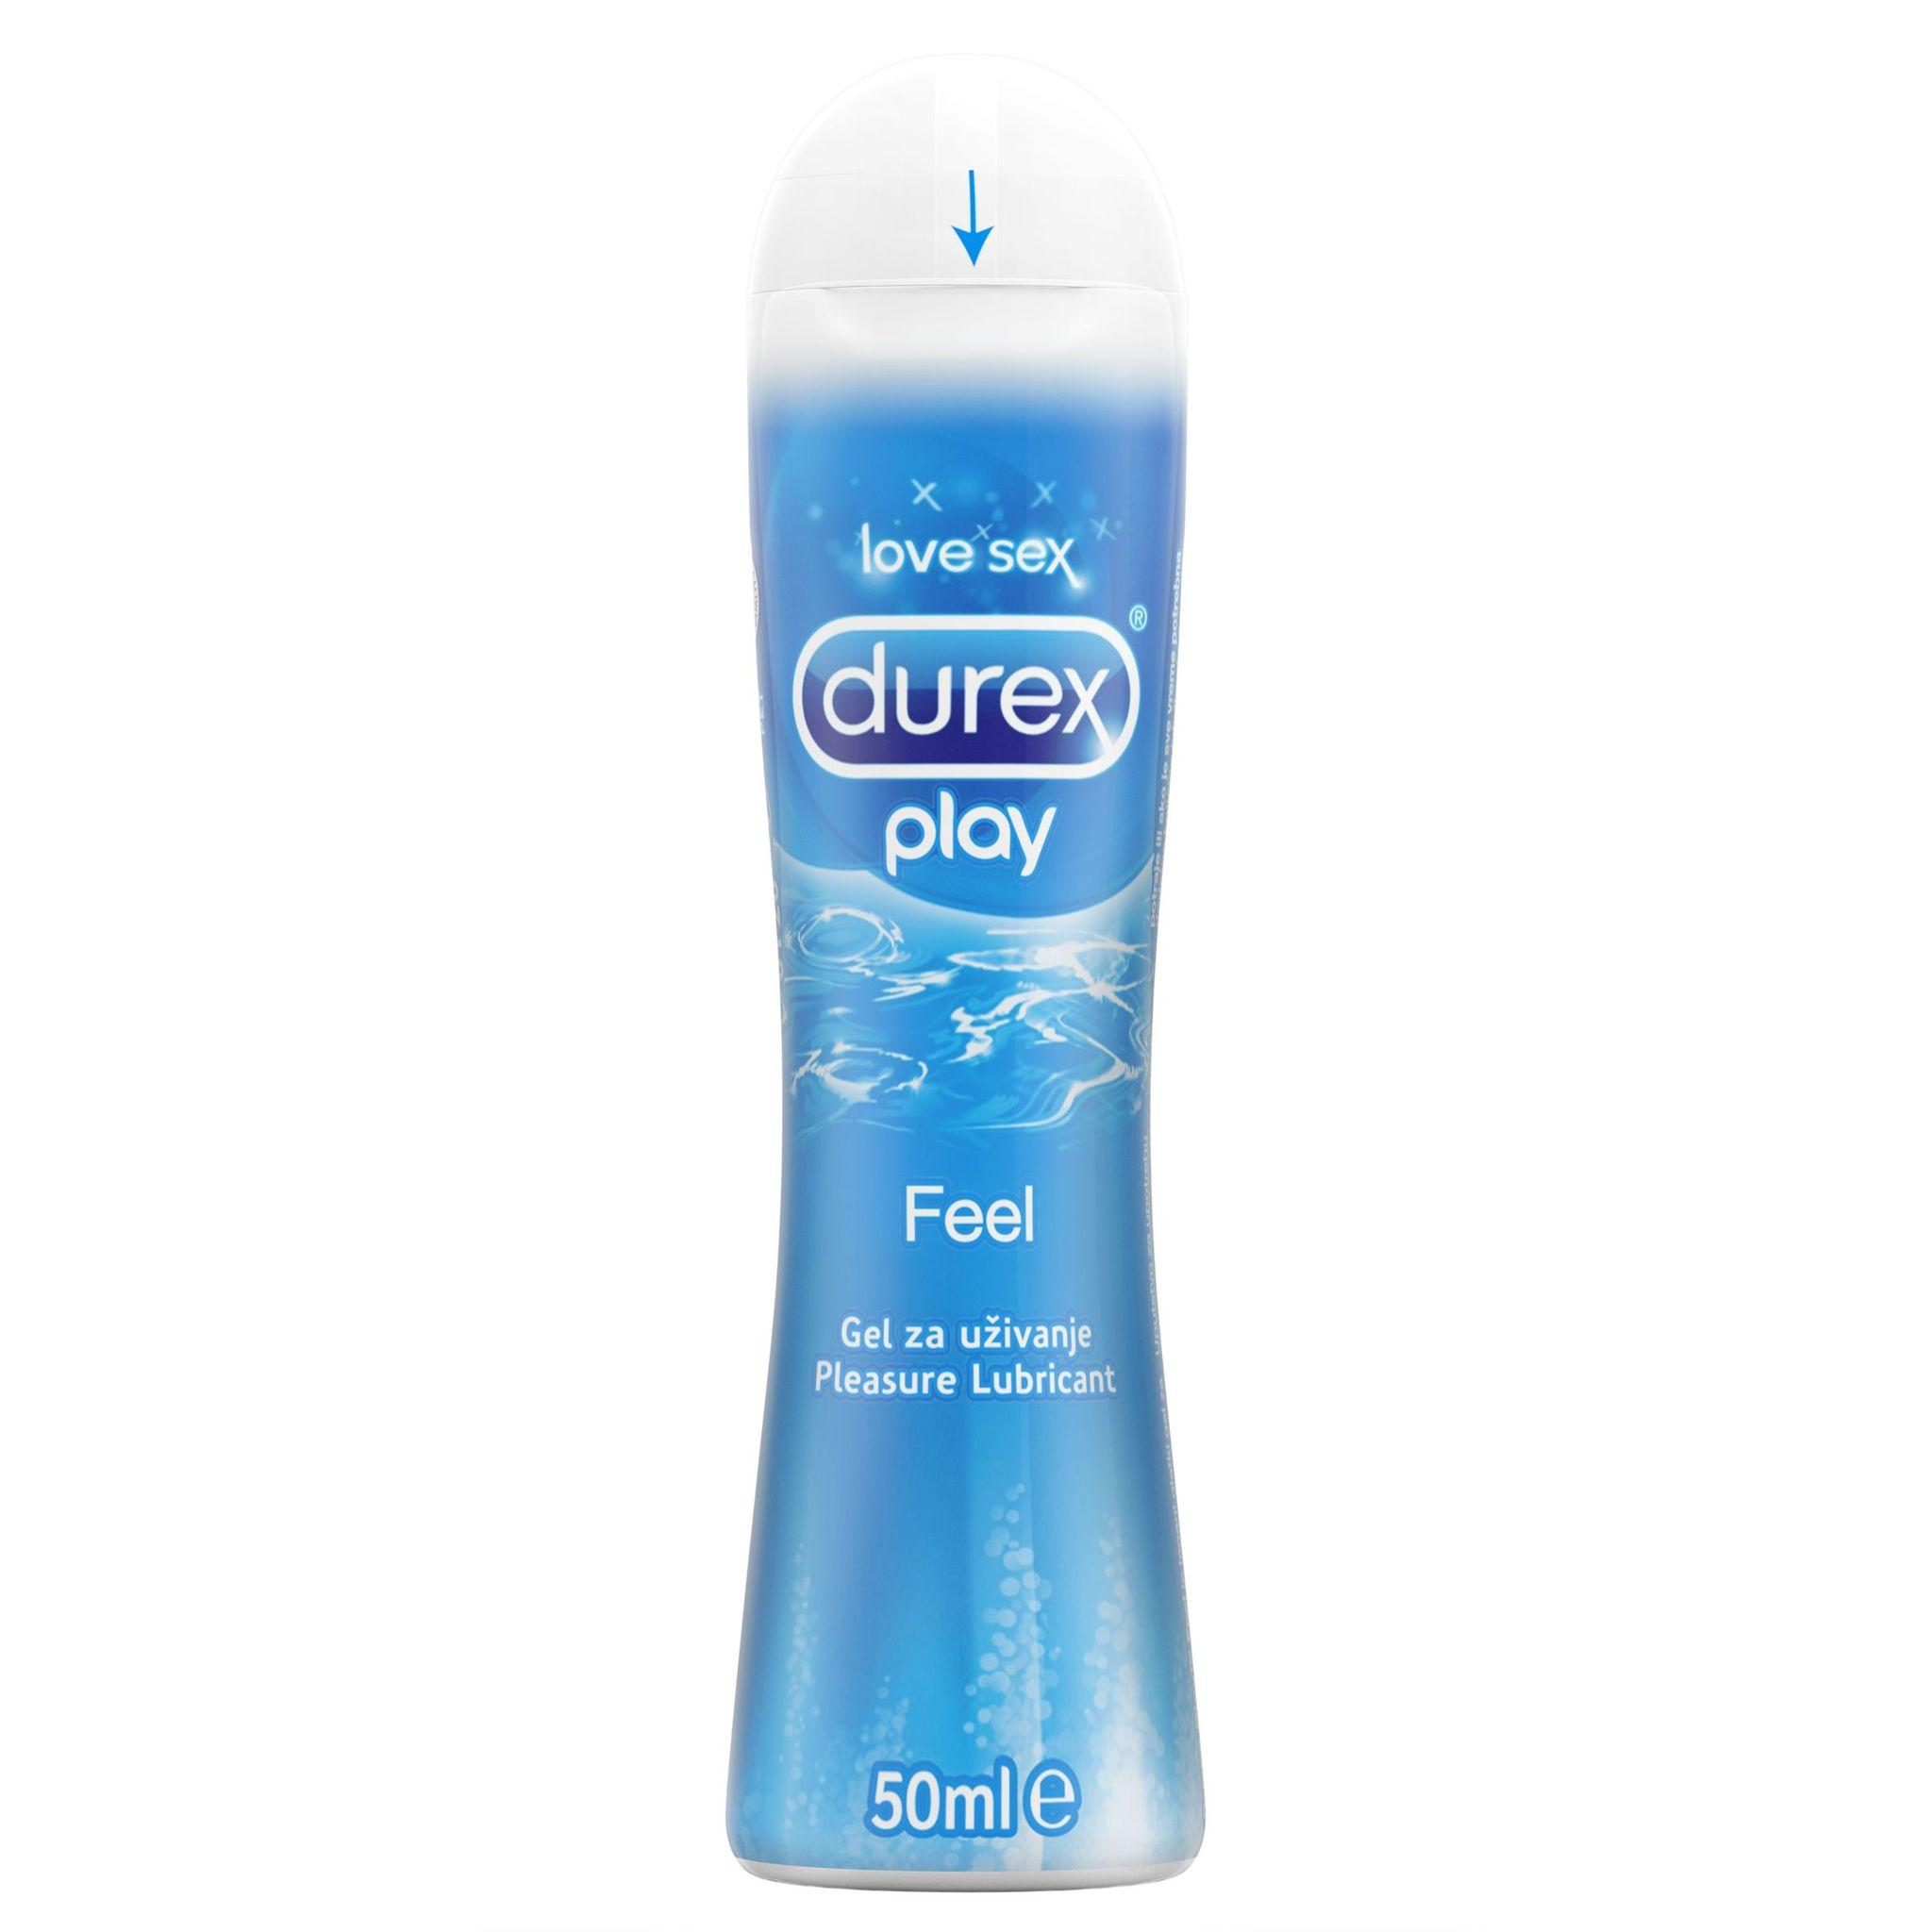 Durex Play síkosító gél Feel 50ml